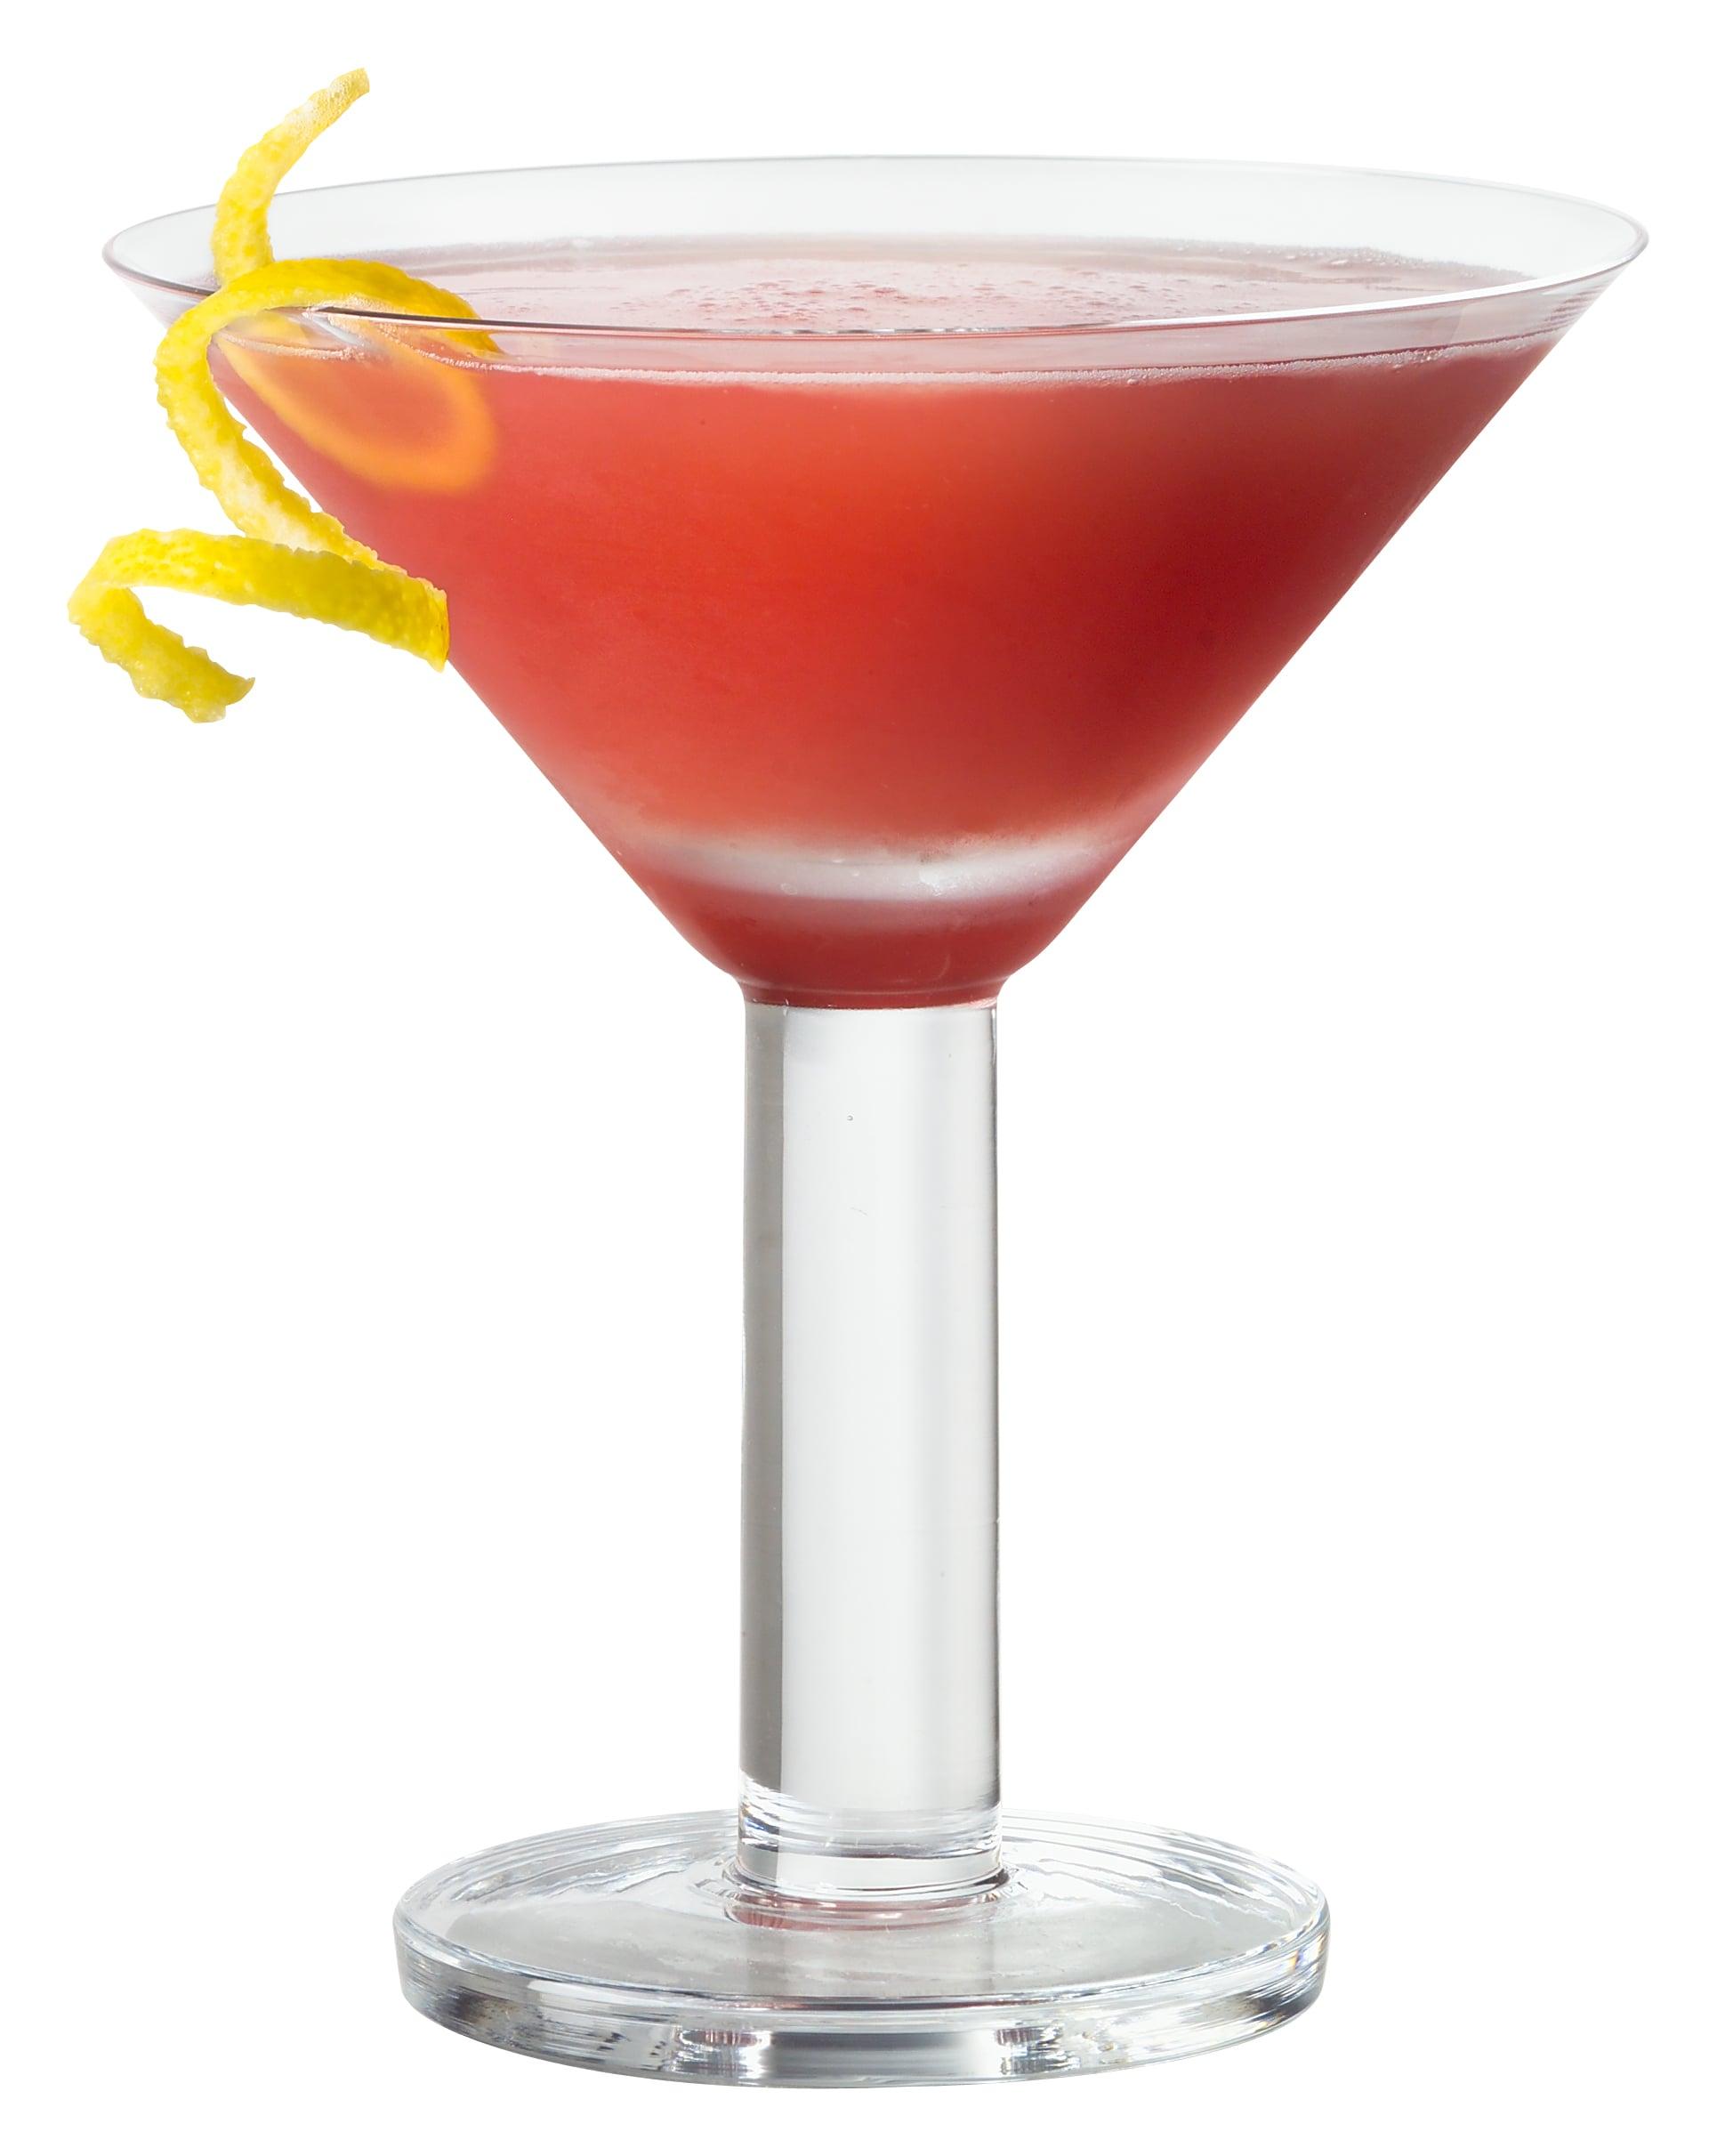 gin pomegranate cocktail perfect for valentines day popsugar food - Valentine Drink